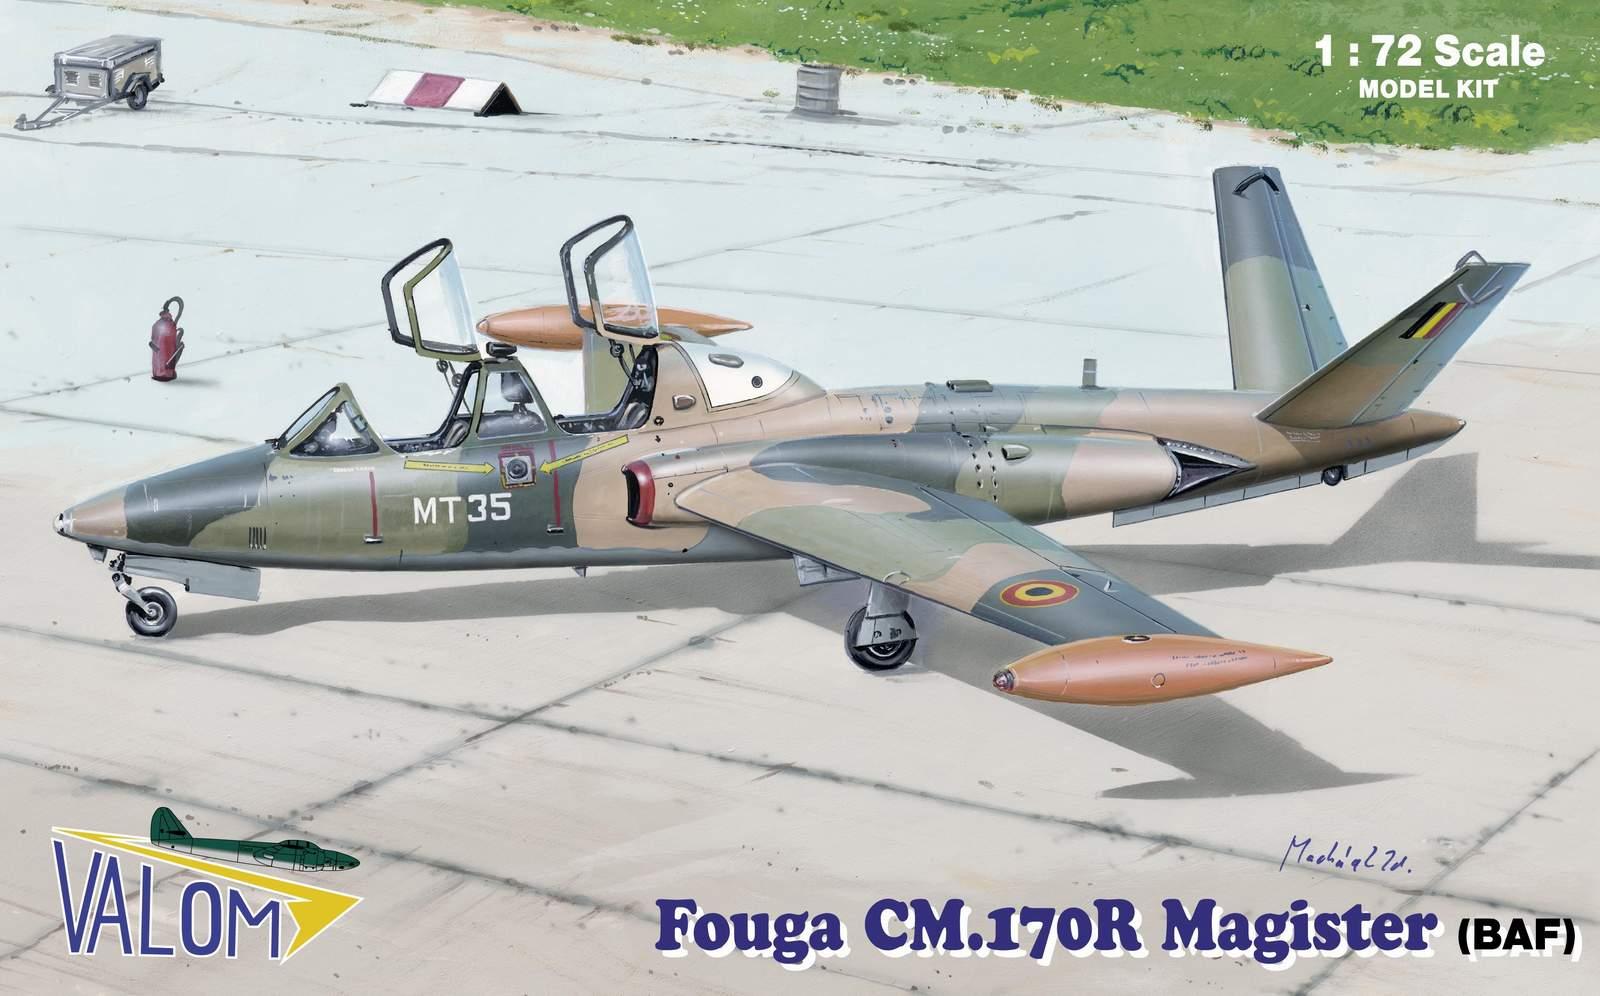 Valom Fouga CM.170R Magister (BAF)